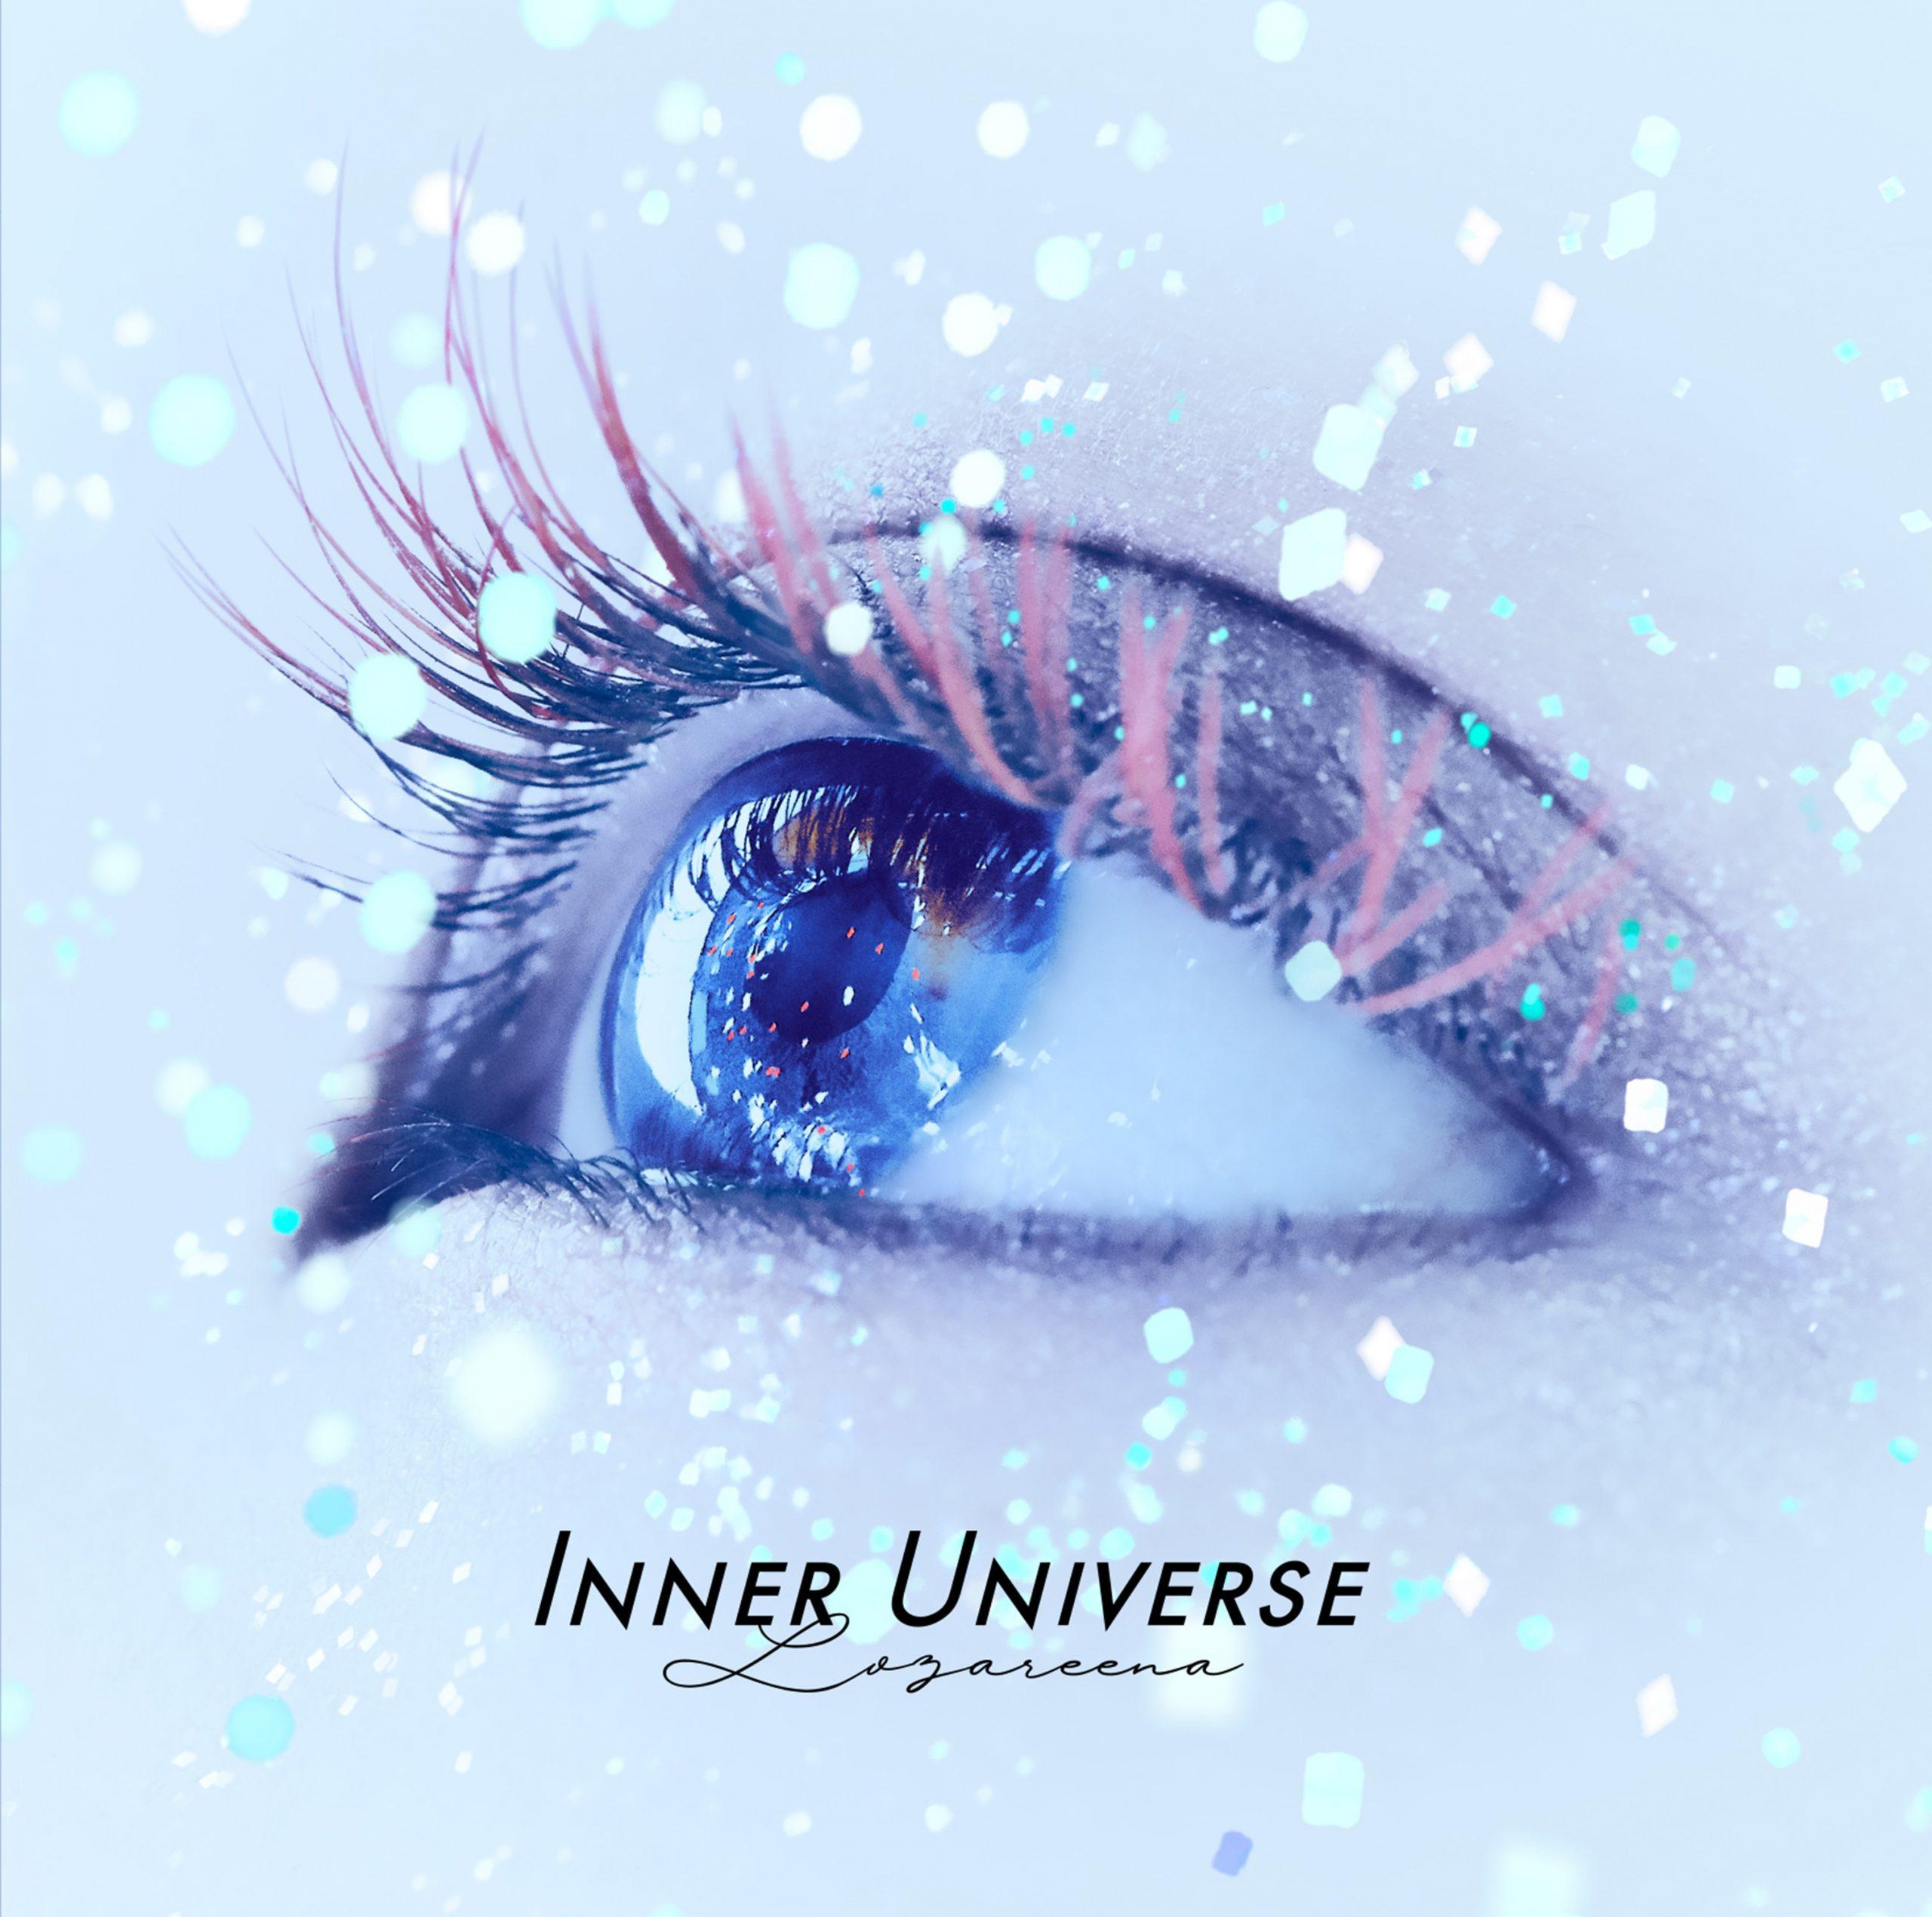 Lozareena - INNER UNIVERSE / ロザリーナ